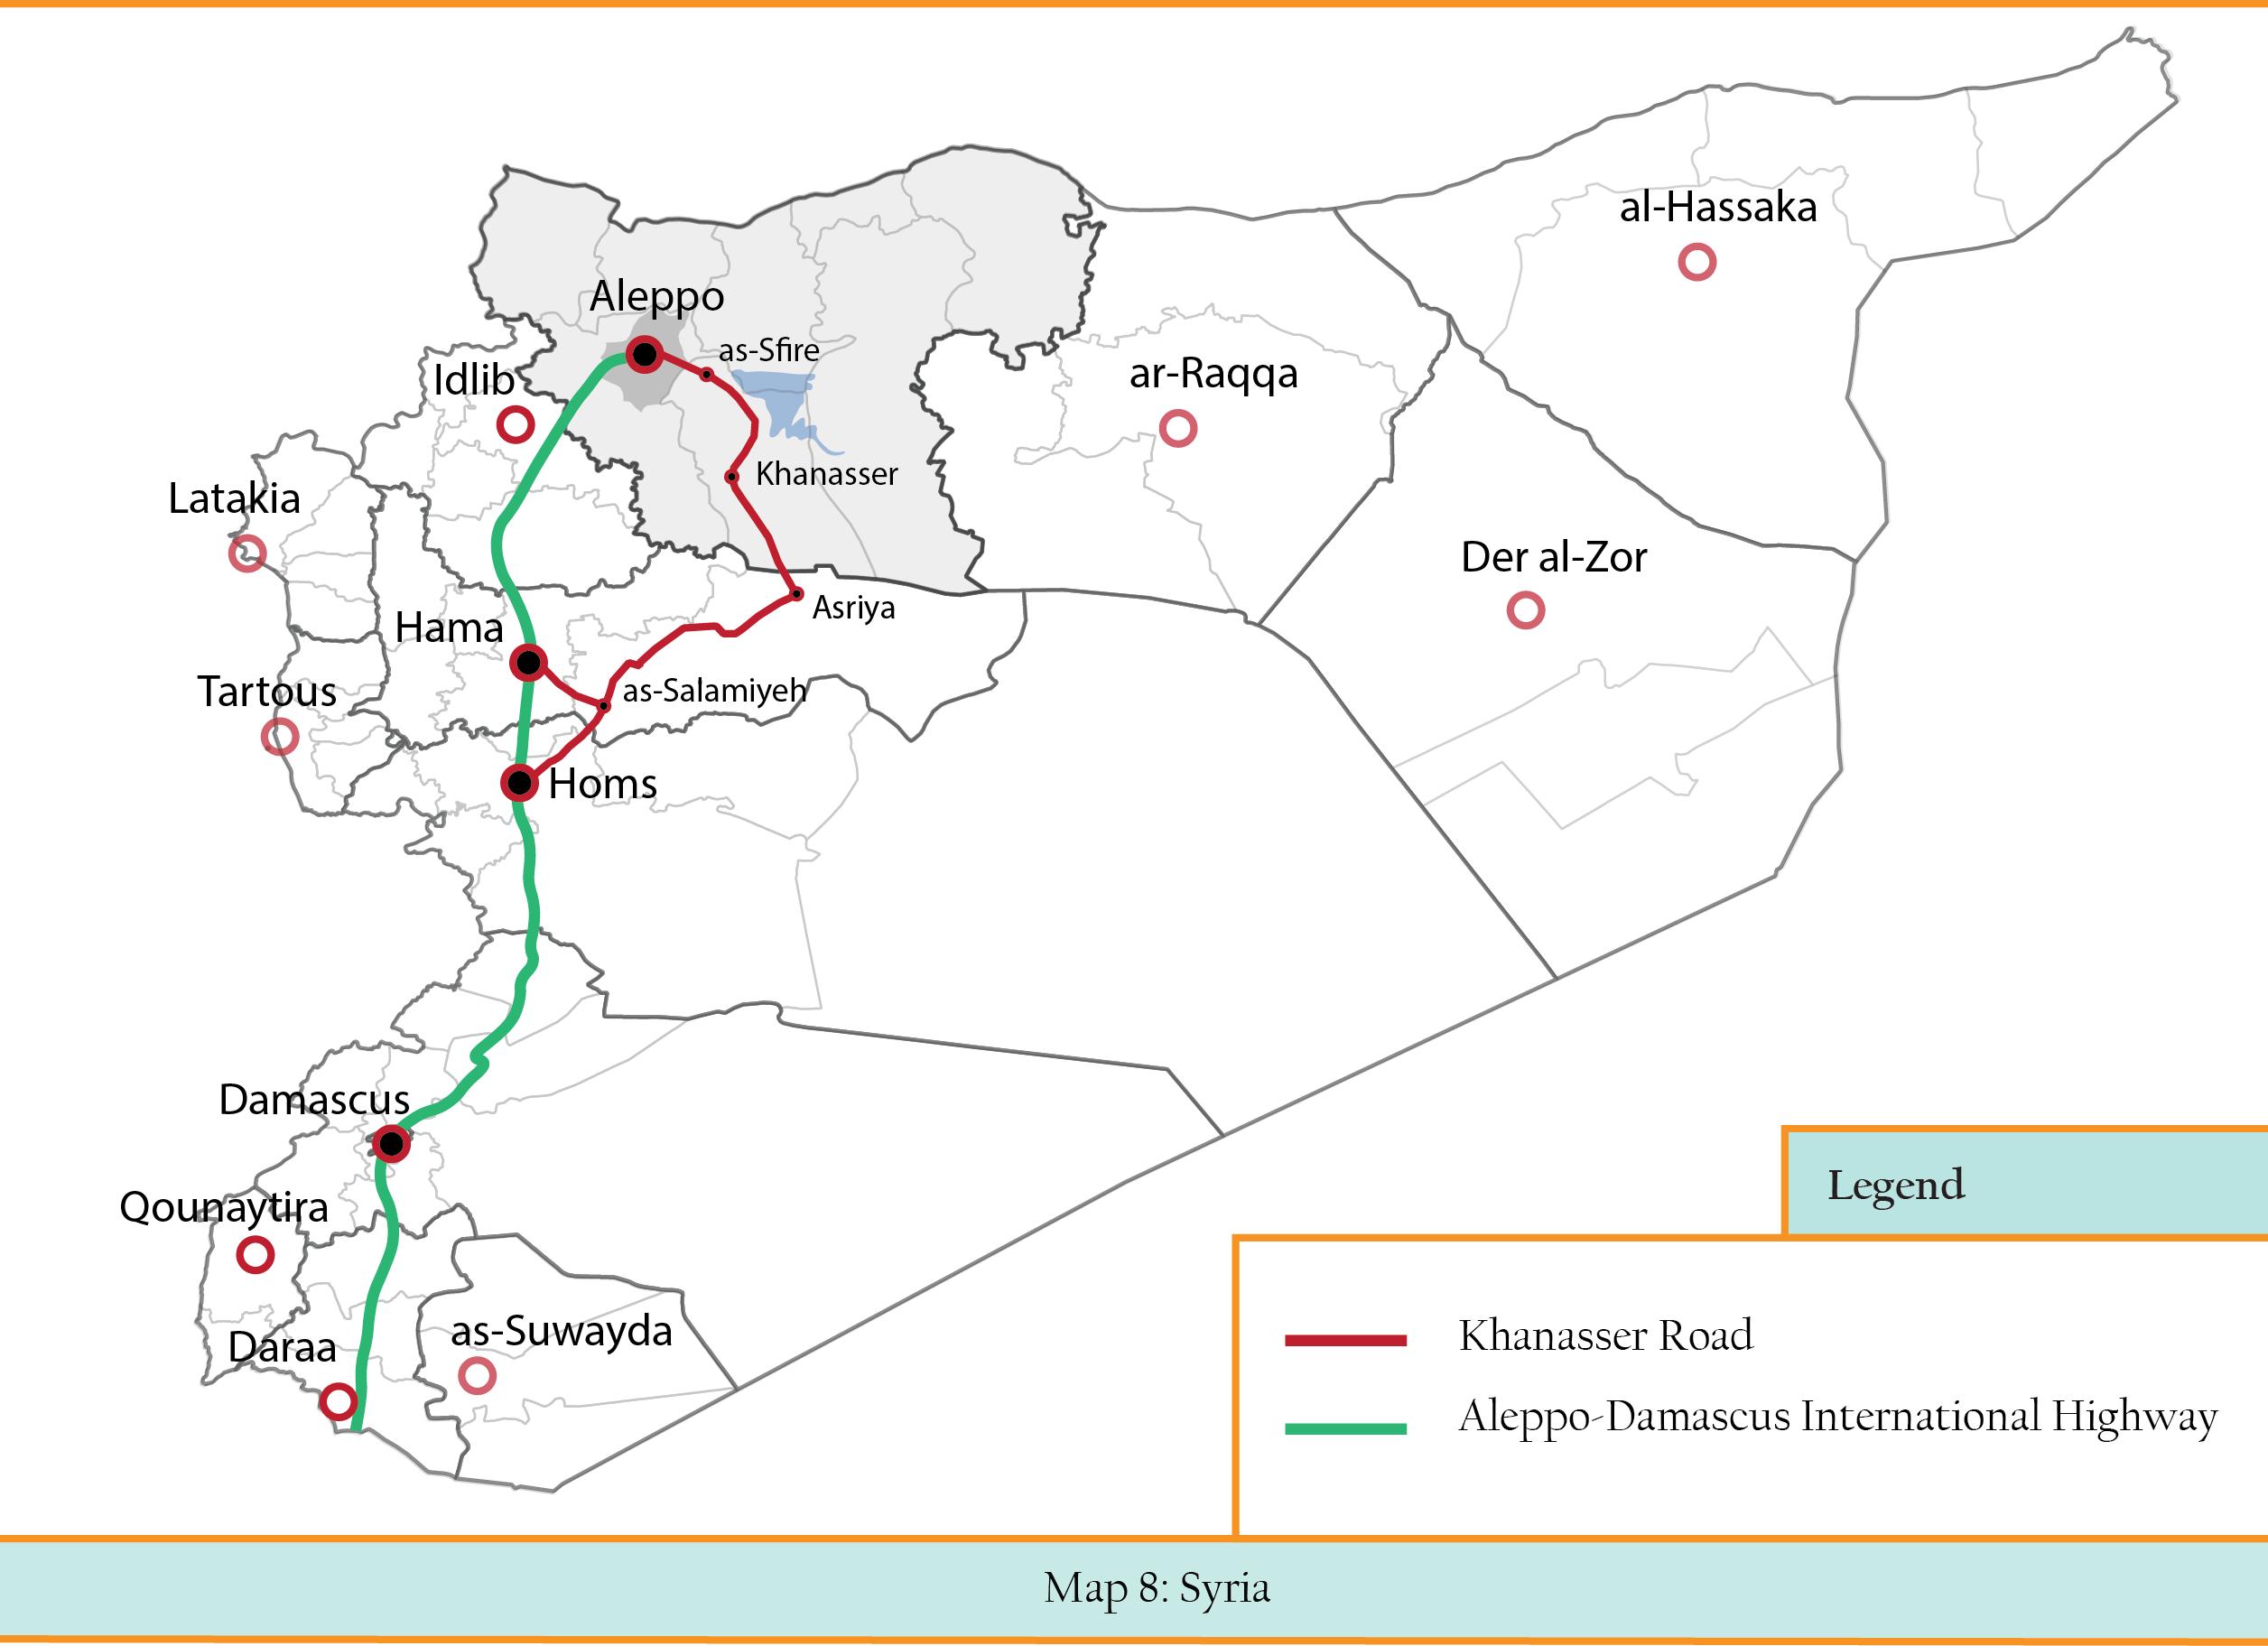 Map 8 -- Khanaser road (Map C)